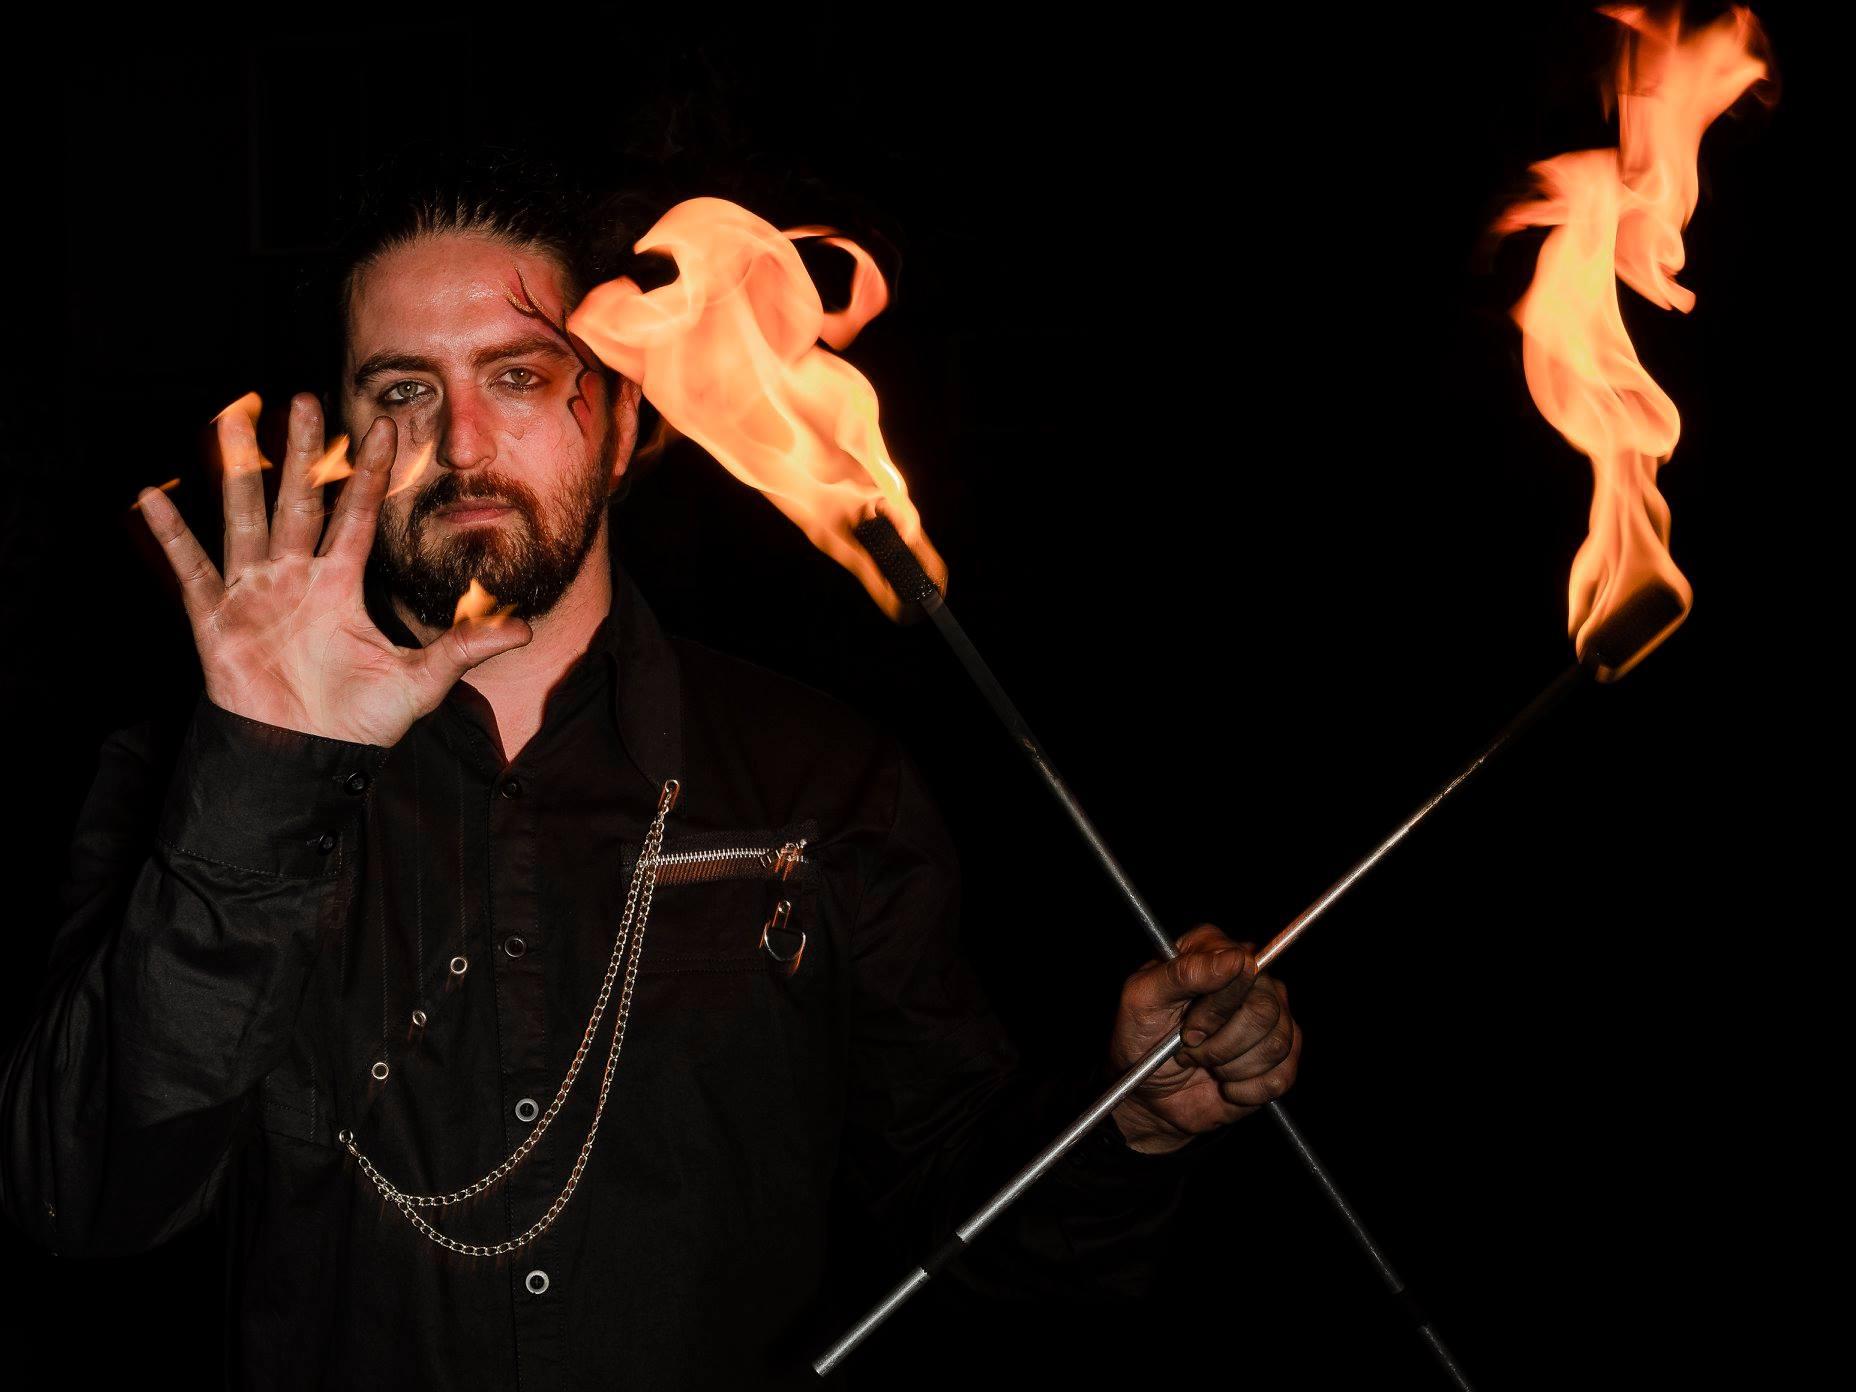 Montreal Fire Eater Dart Vapor Flamewater Circus